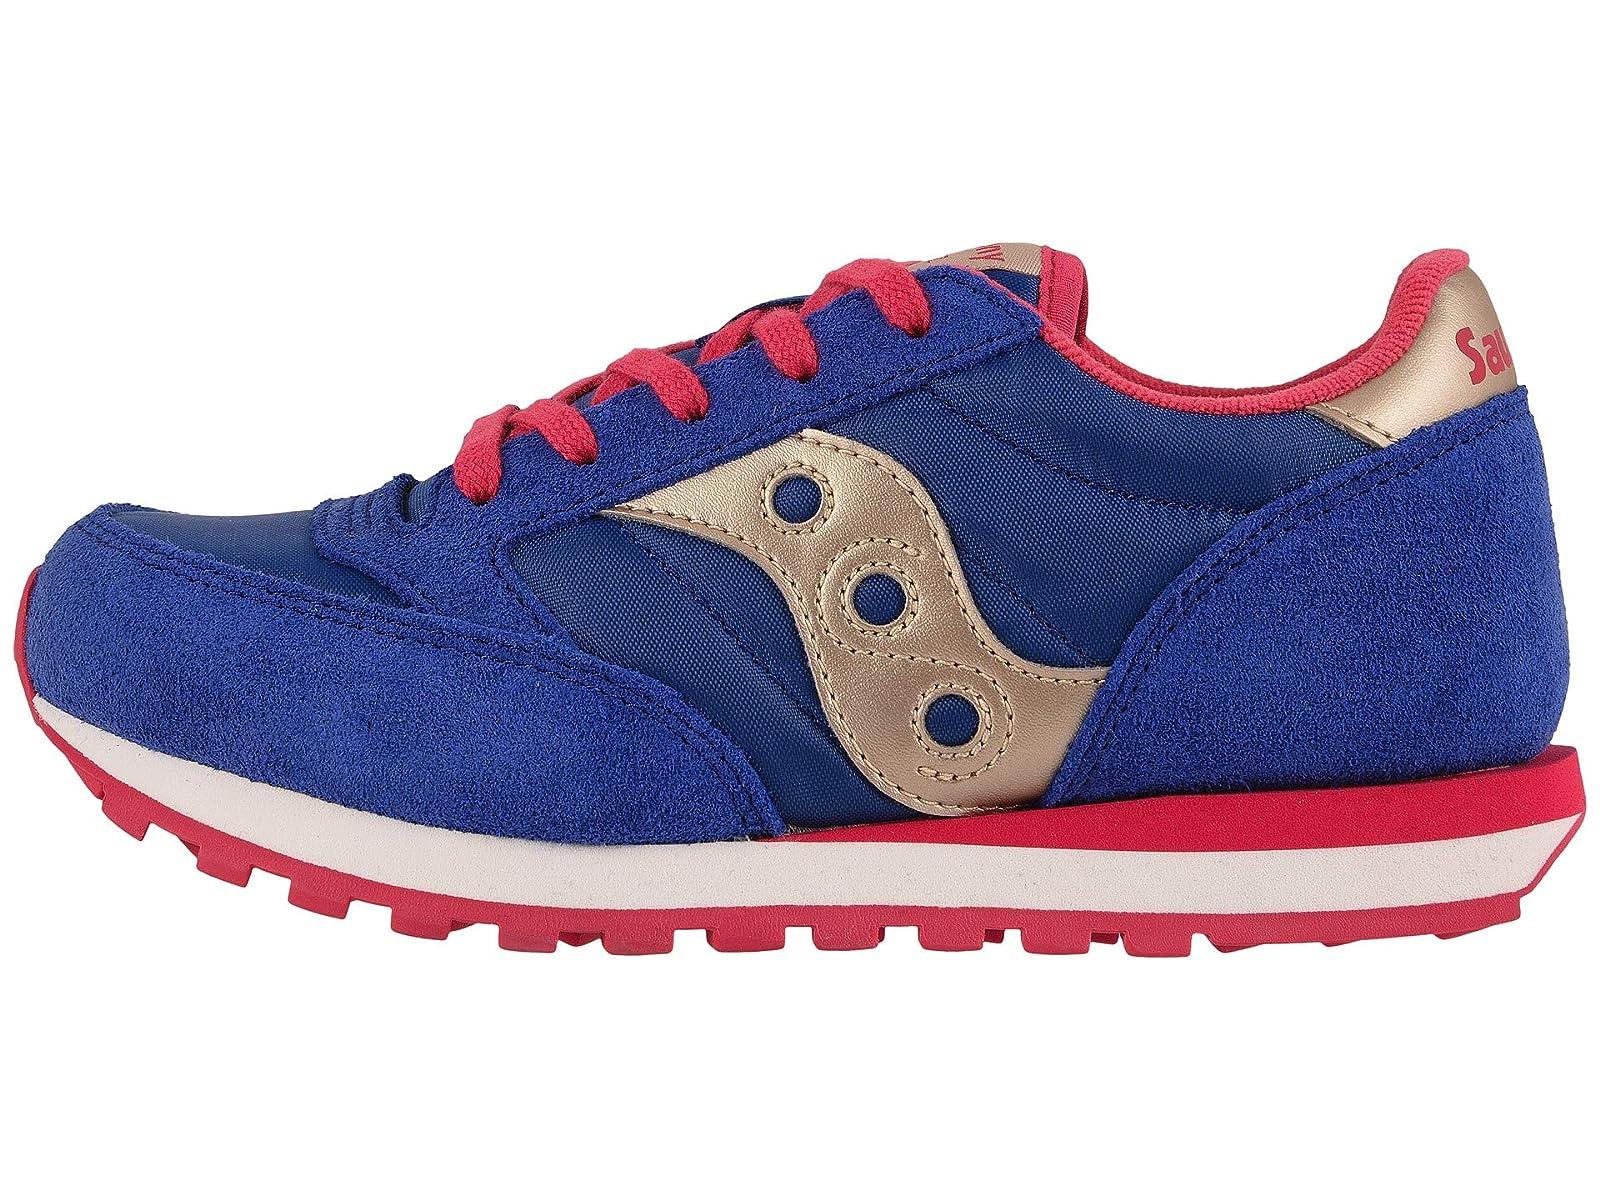 fc67107a6a Details about Girl's Shoes Saucony Kids Originals Jazz Original (Little  Kid/Big Kid)